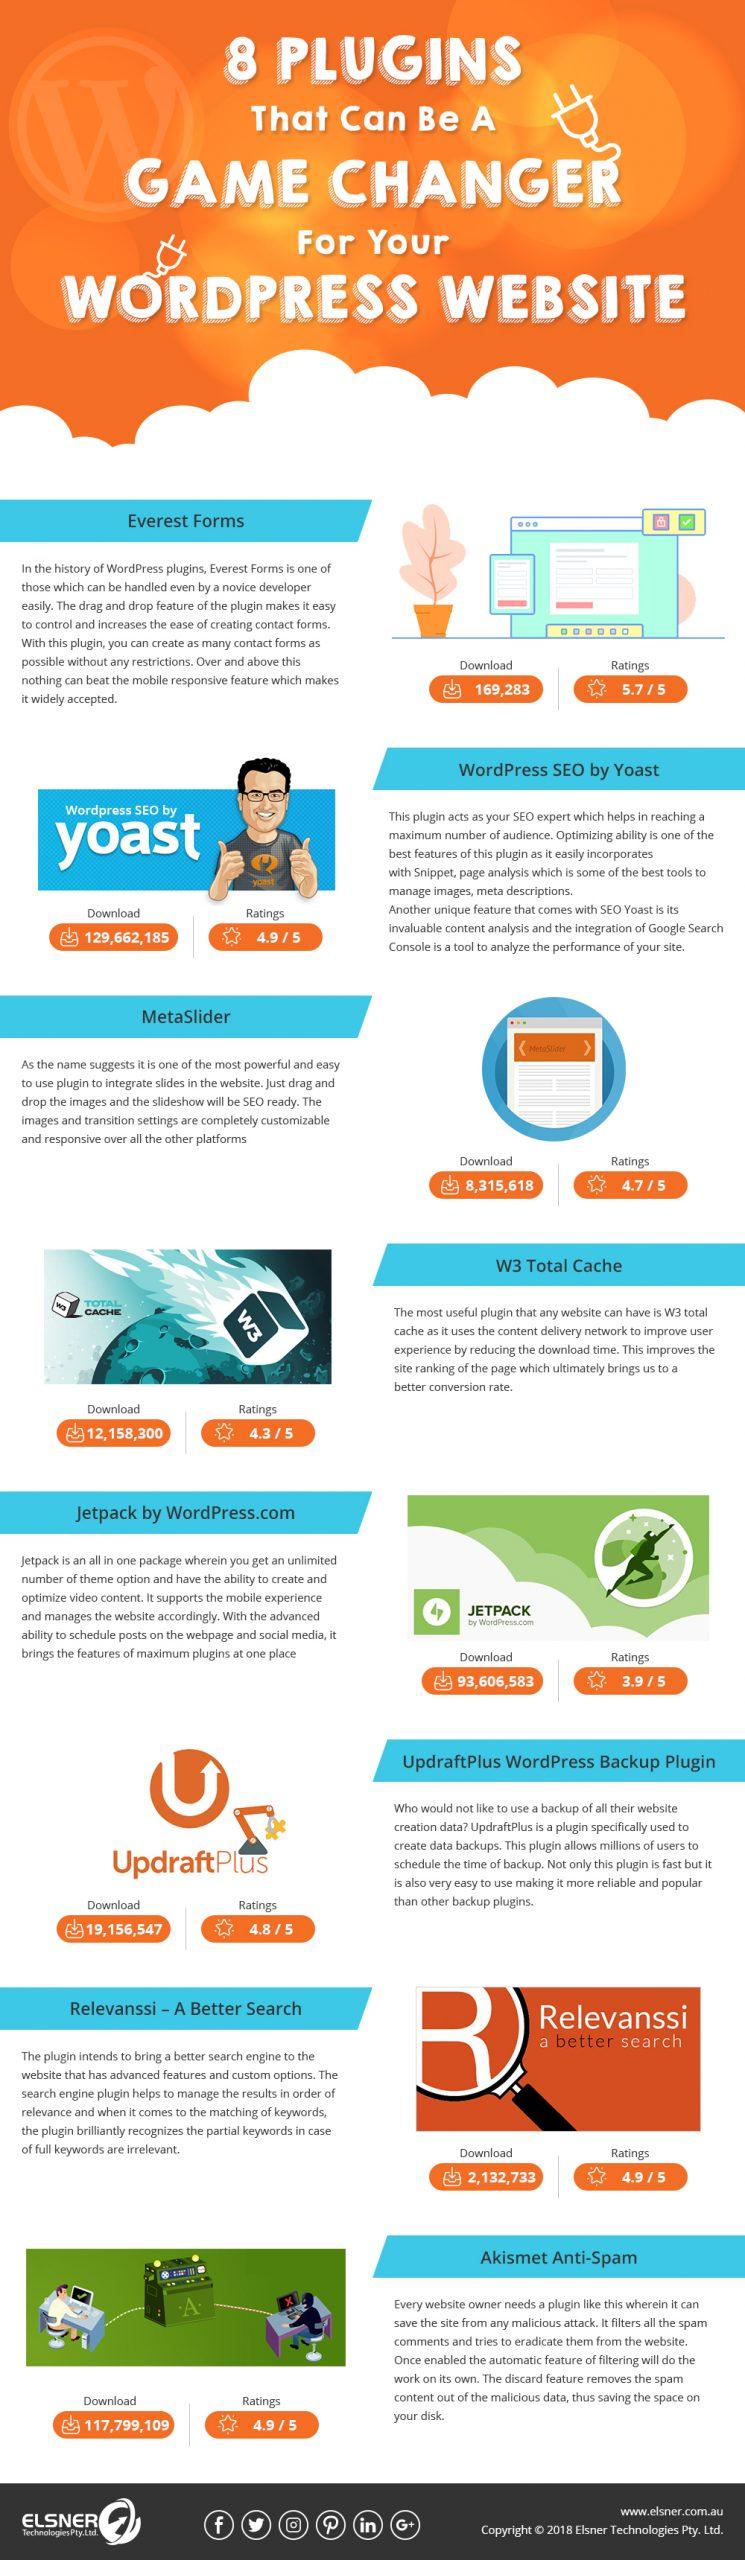 WordPress Plugins - infographic